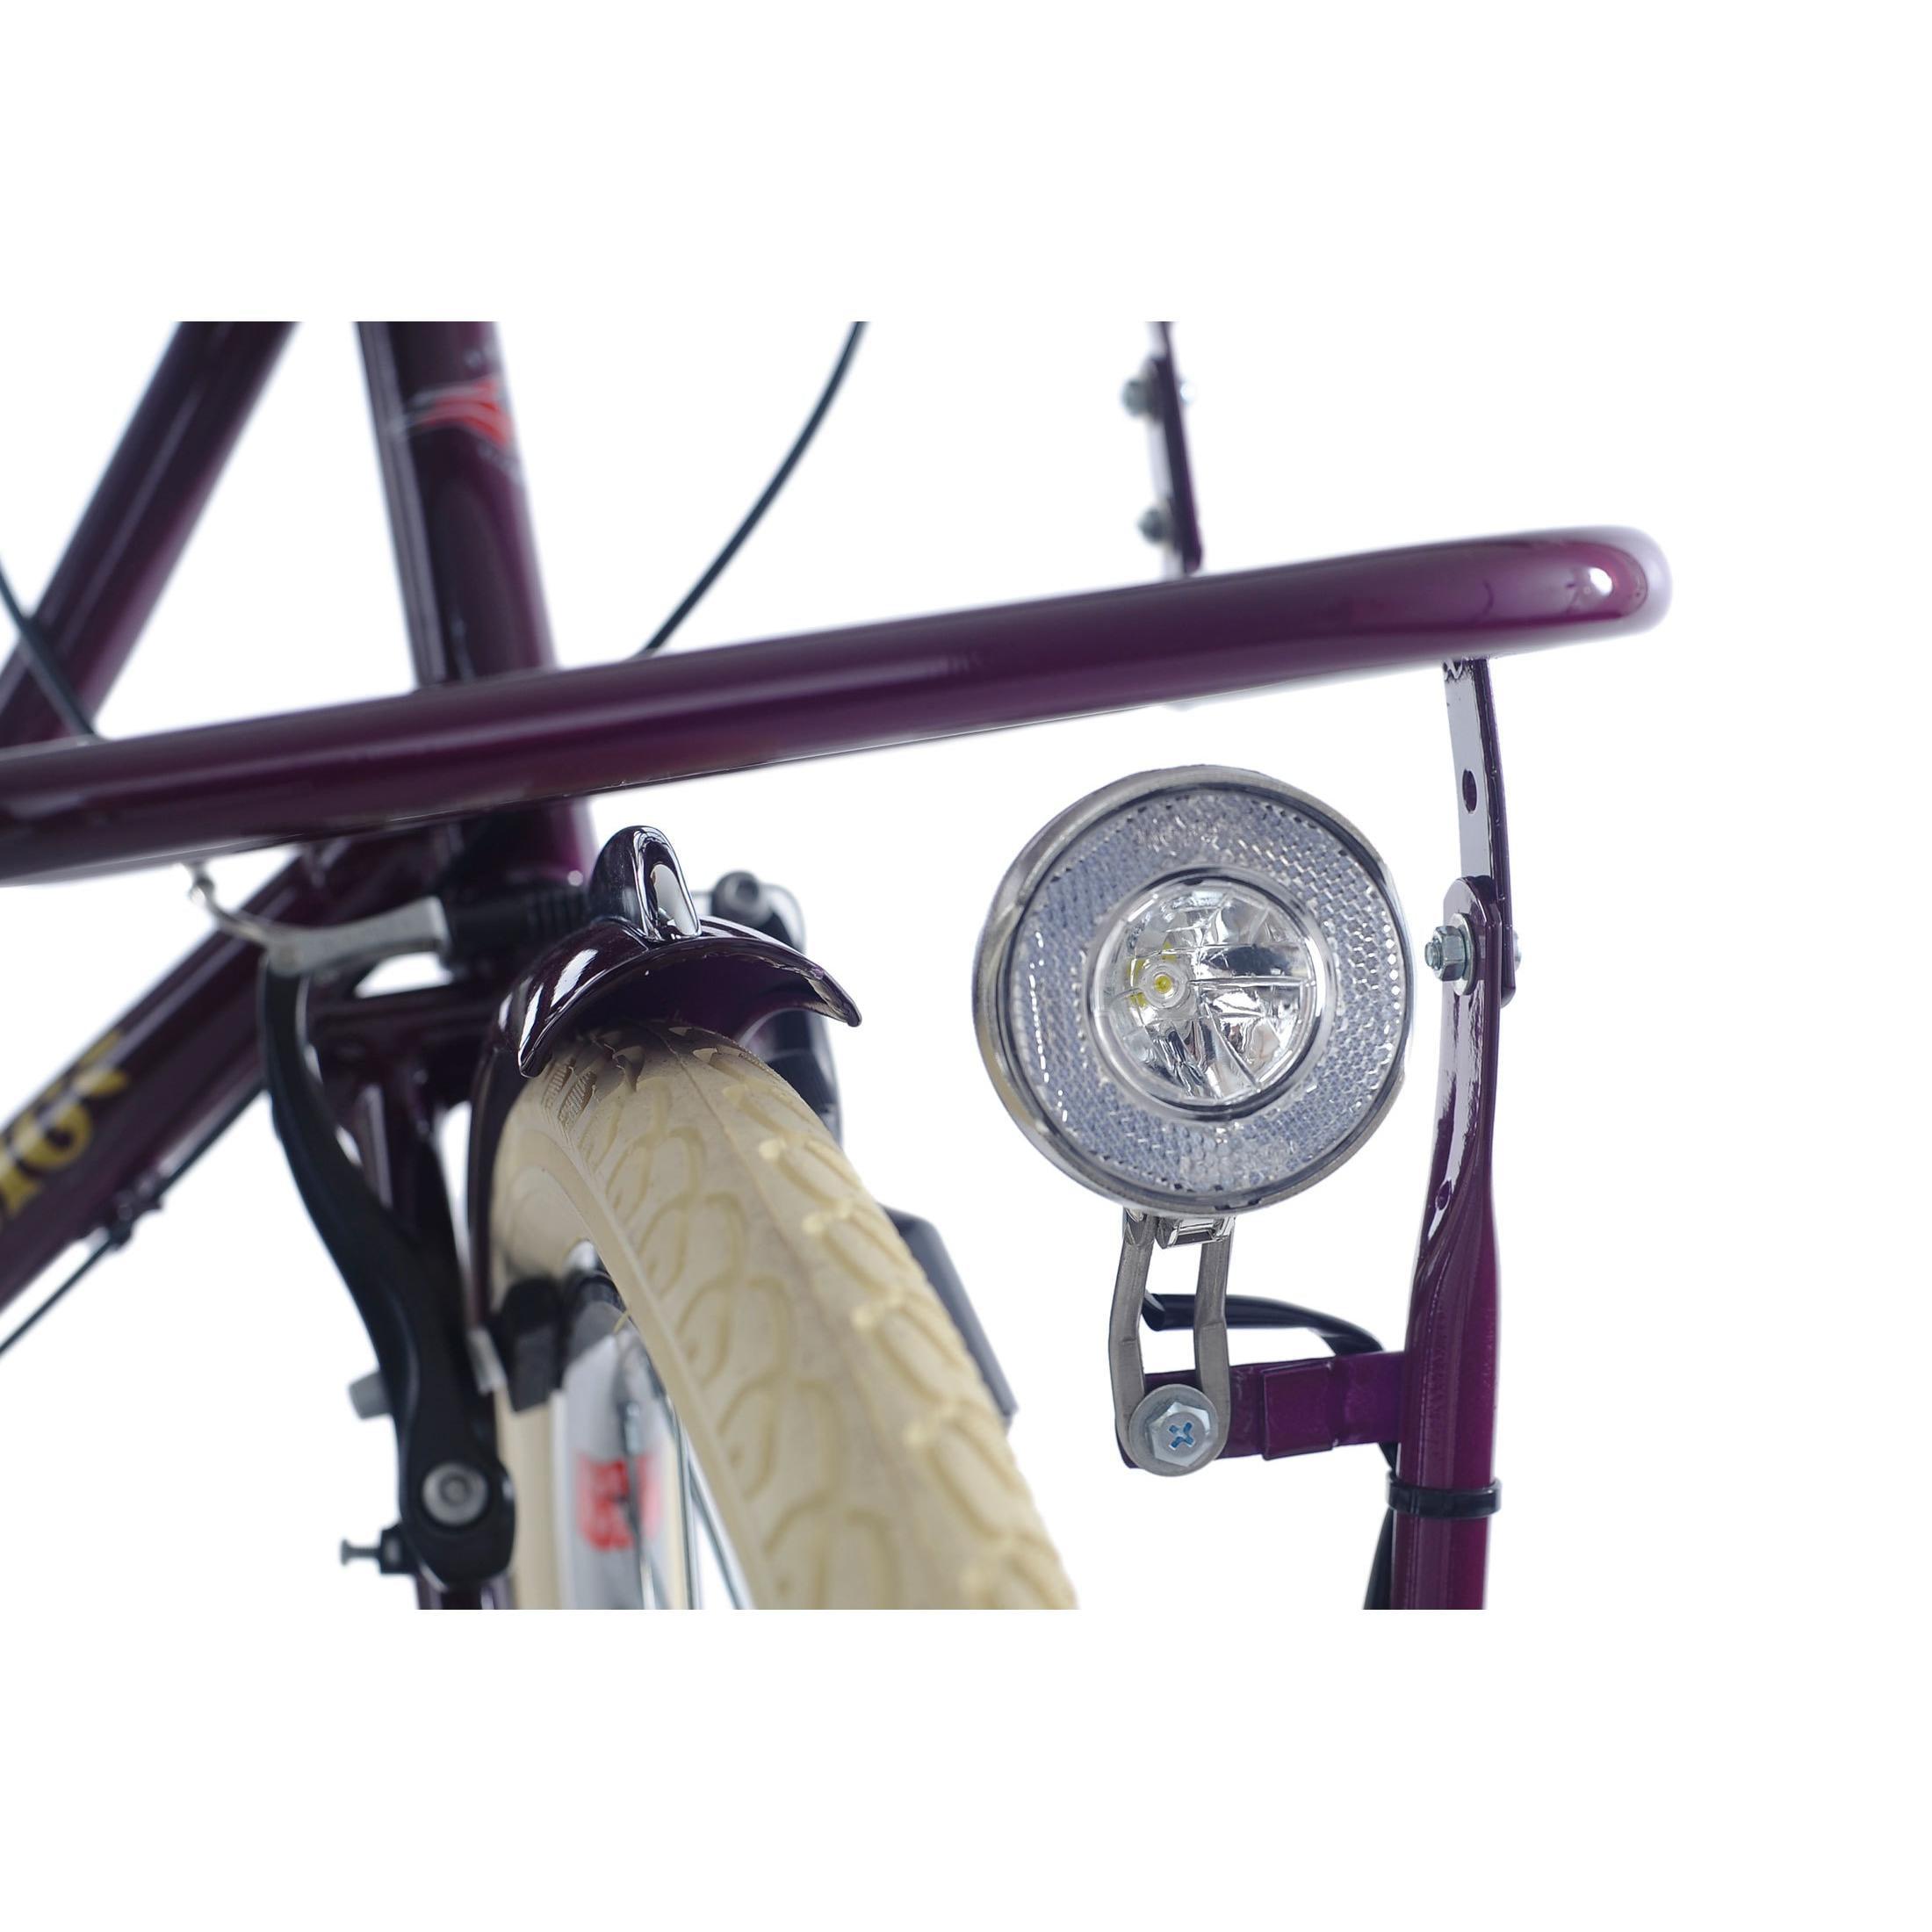 KS Cycling Damenfahrrad Hollandrad Cargo Dutch Classic 3 Gänge, 26 Zoll